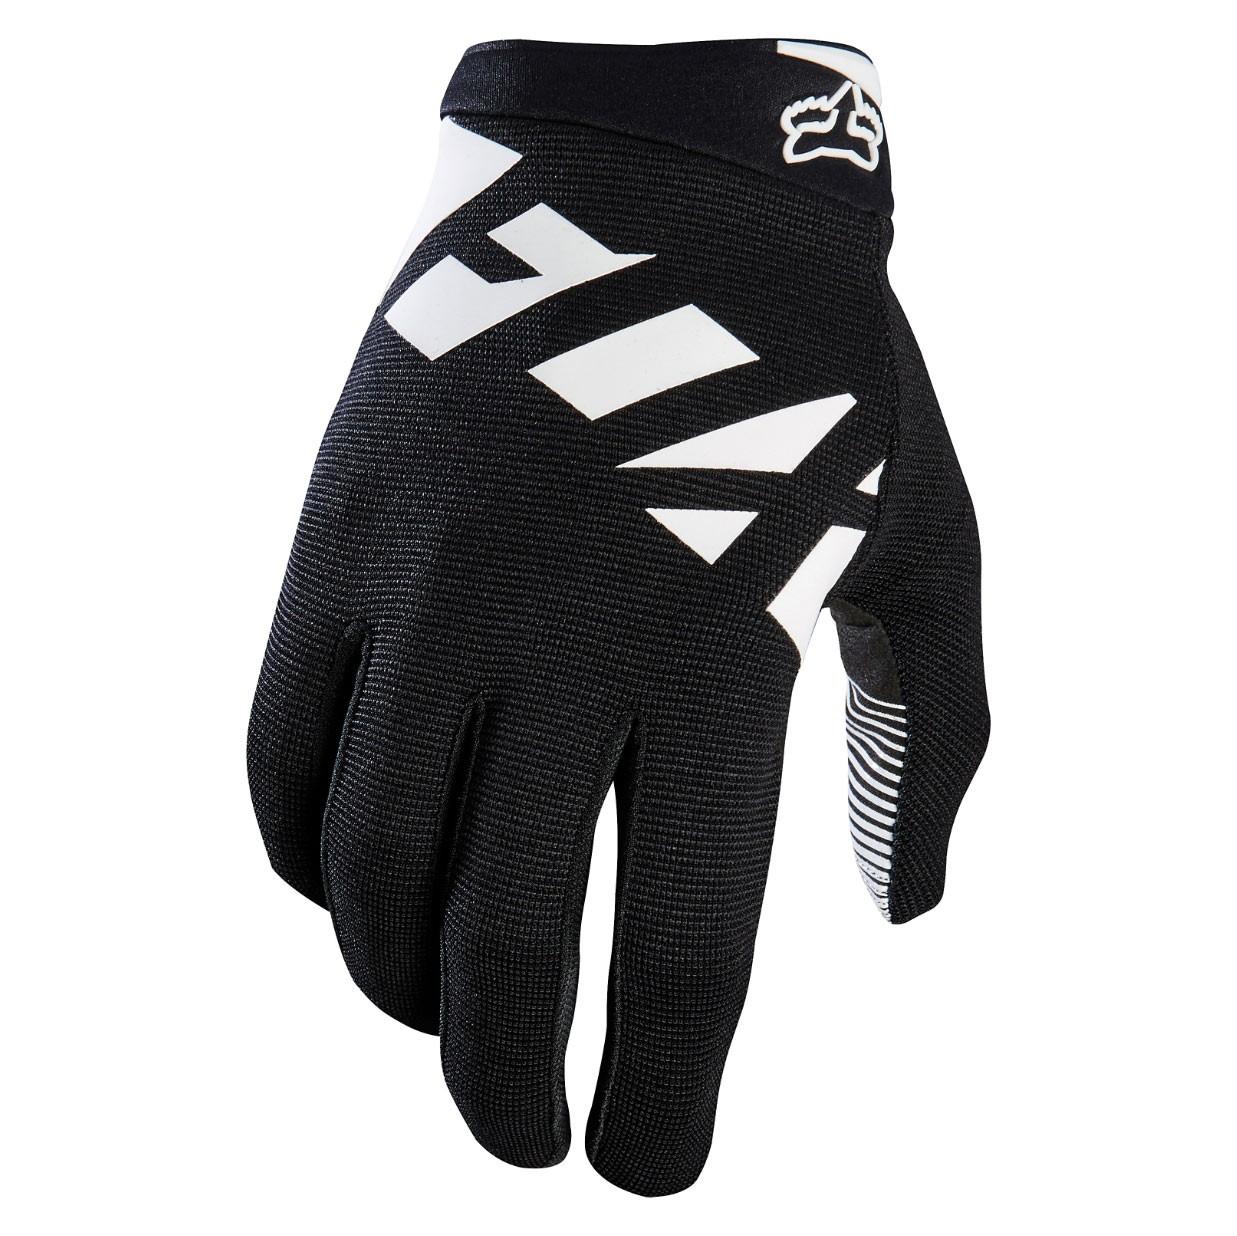 Bike rukavice Fox Ranger black/grey/white